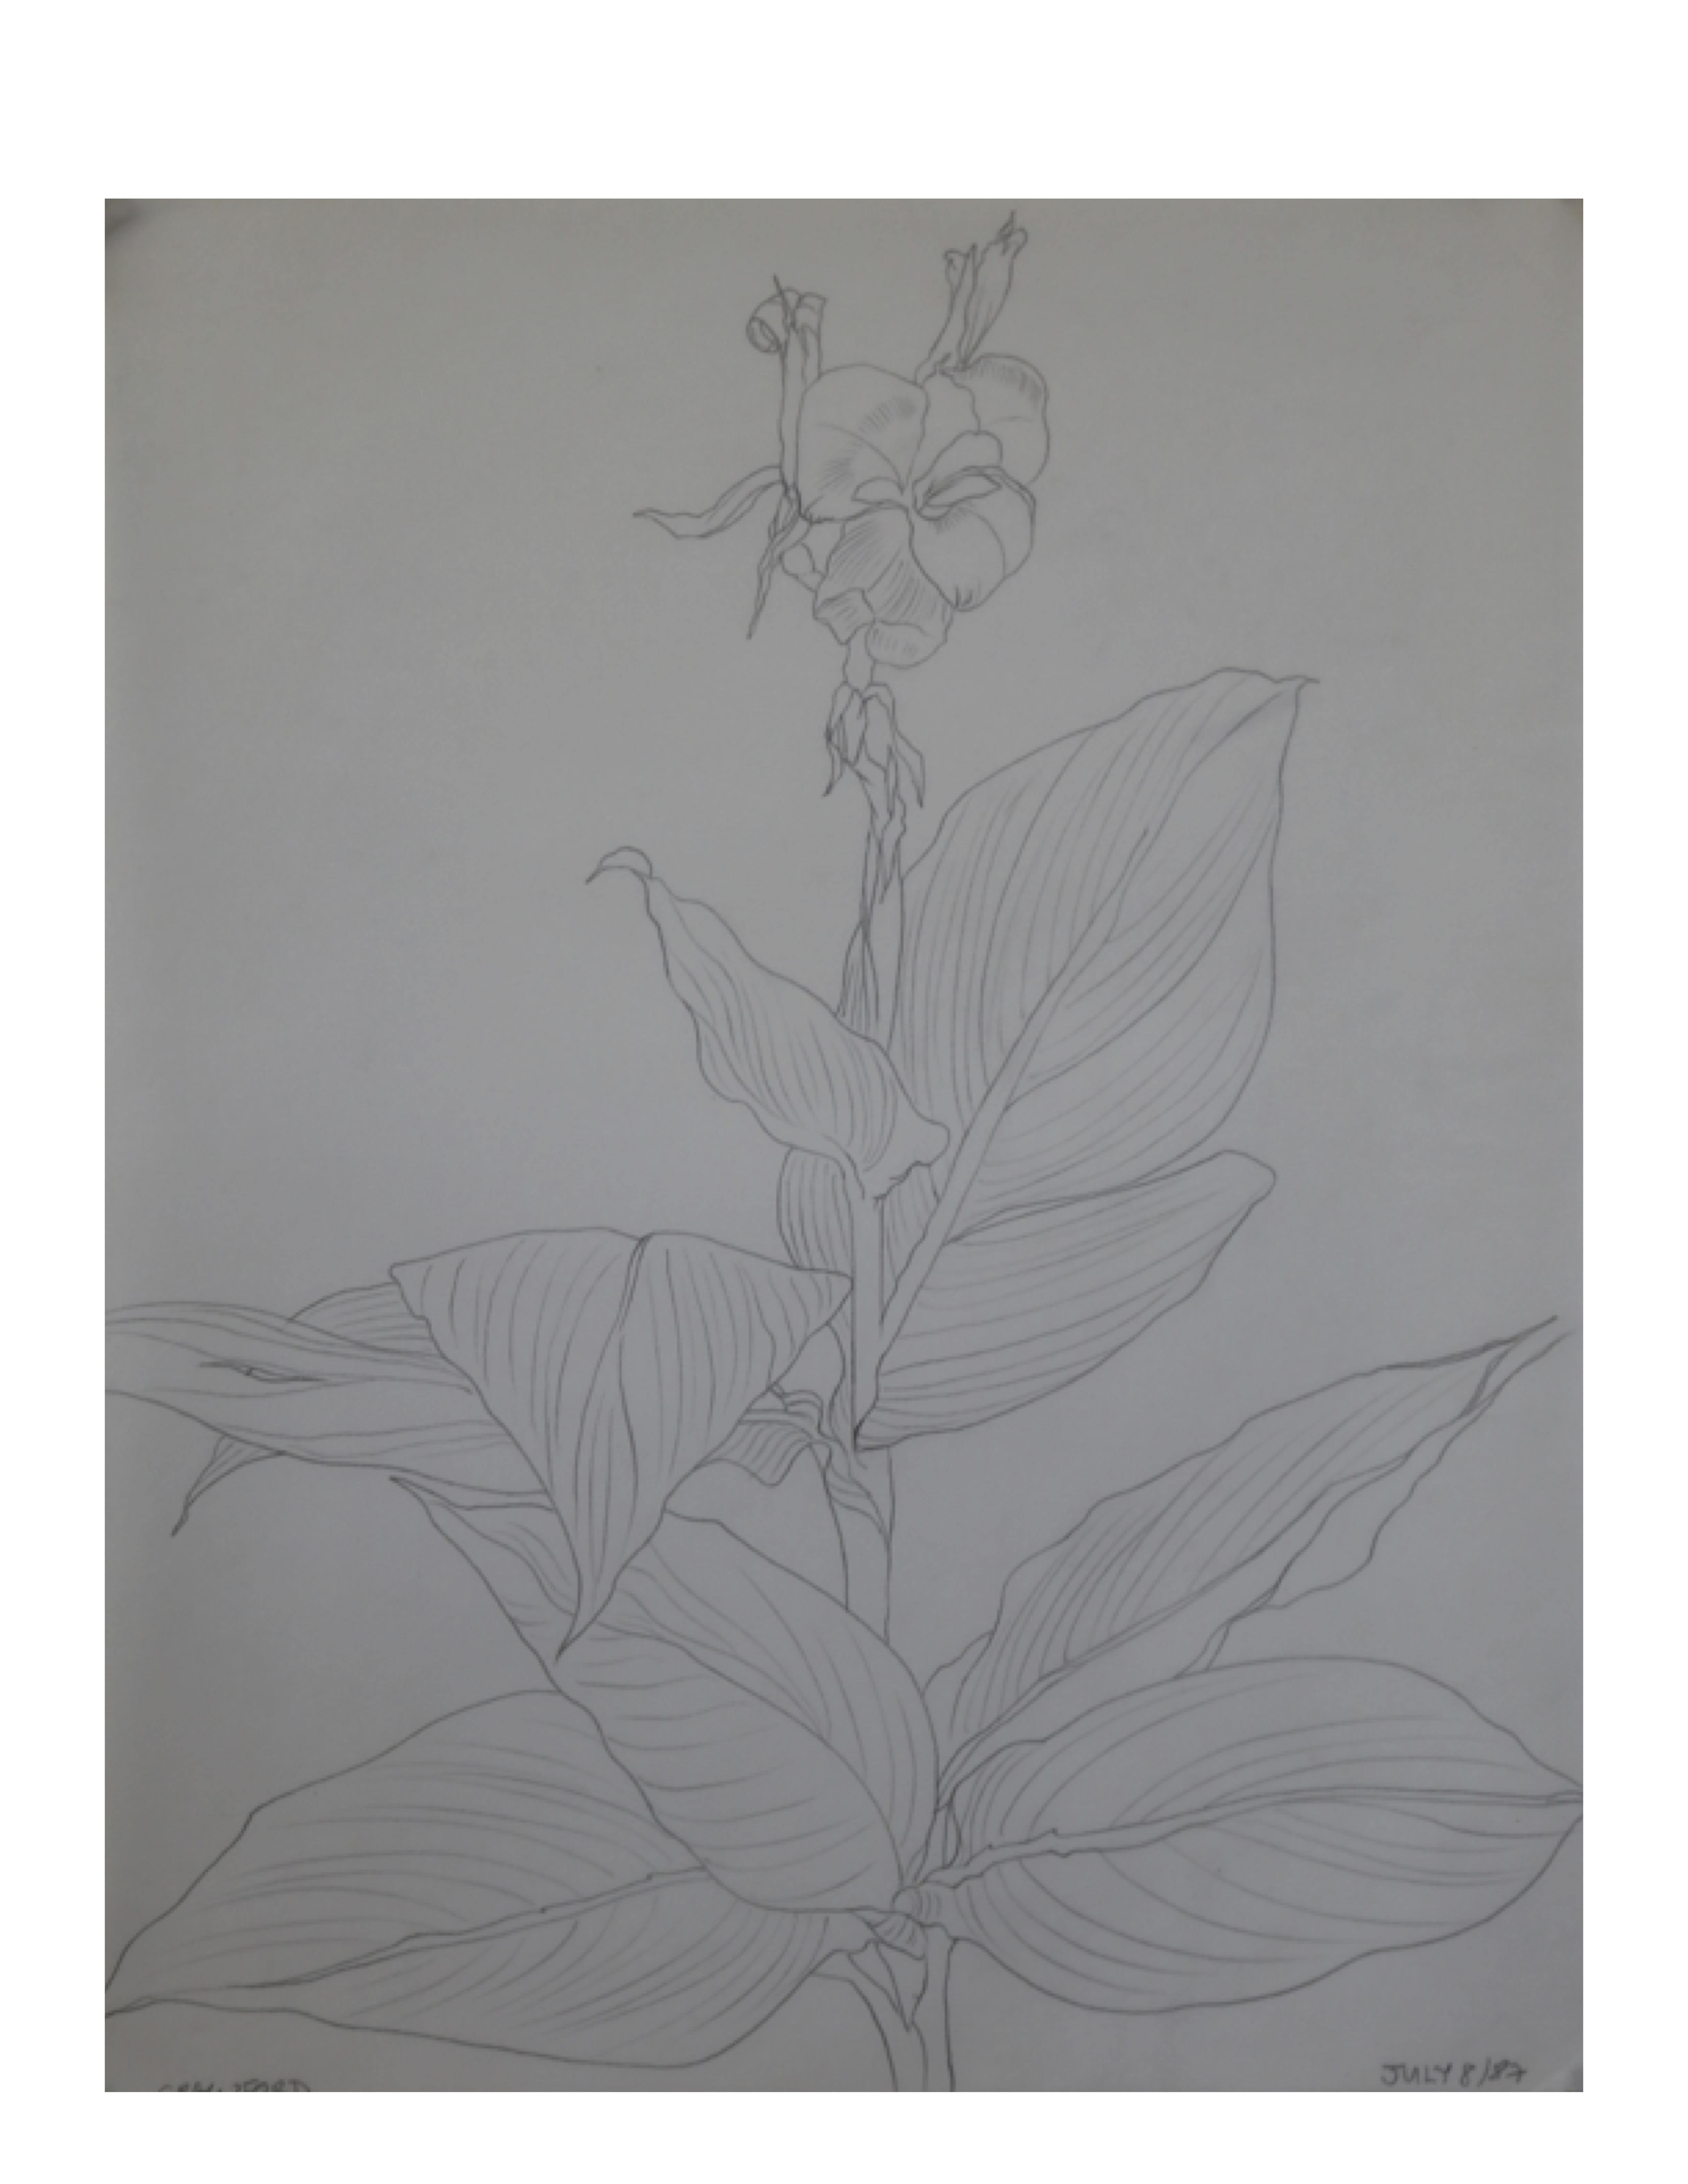 Canna lily Pakistan garden, July 8, 1987, pencil on paper, 27.9 cm x 35.5 cm